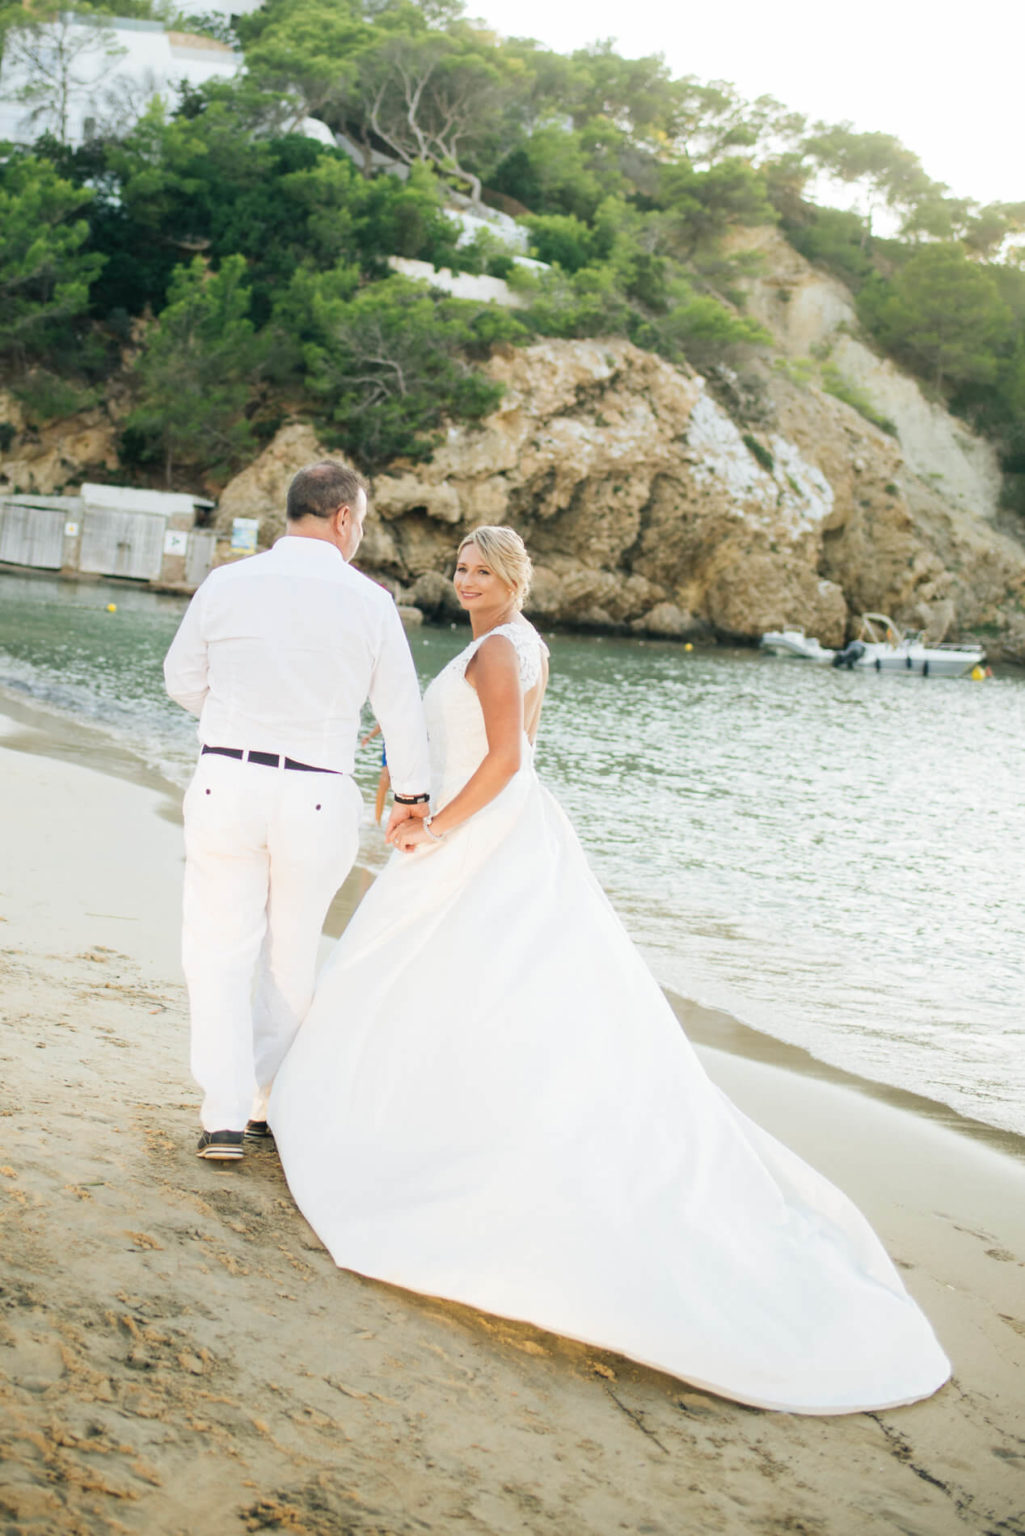 https://www.white-ibiza.com/wp-content/uploads/2020/03/ibiza-wedding-venue-maya-beach-club-2020-06-1025x1536.jpg